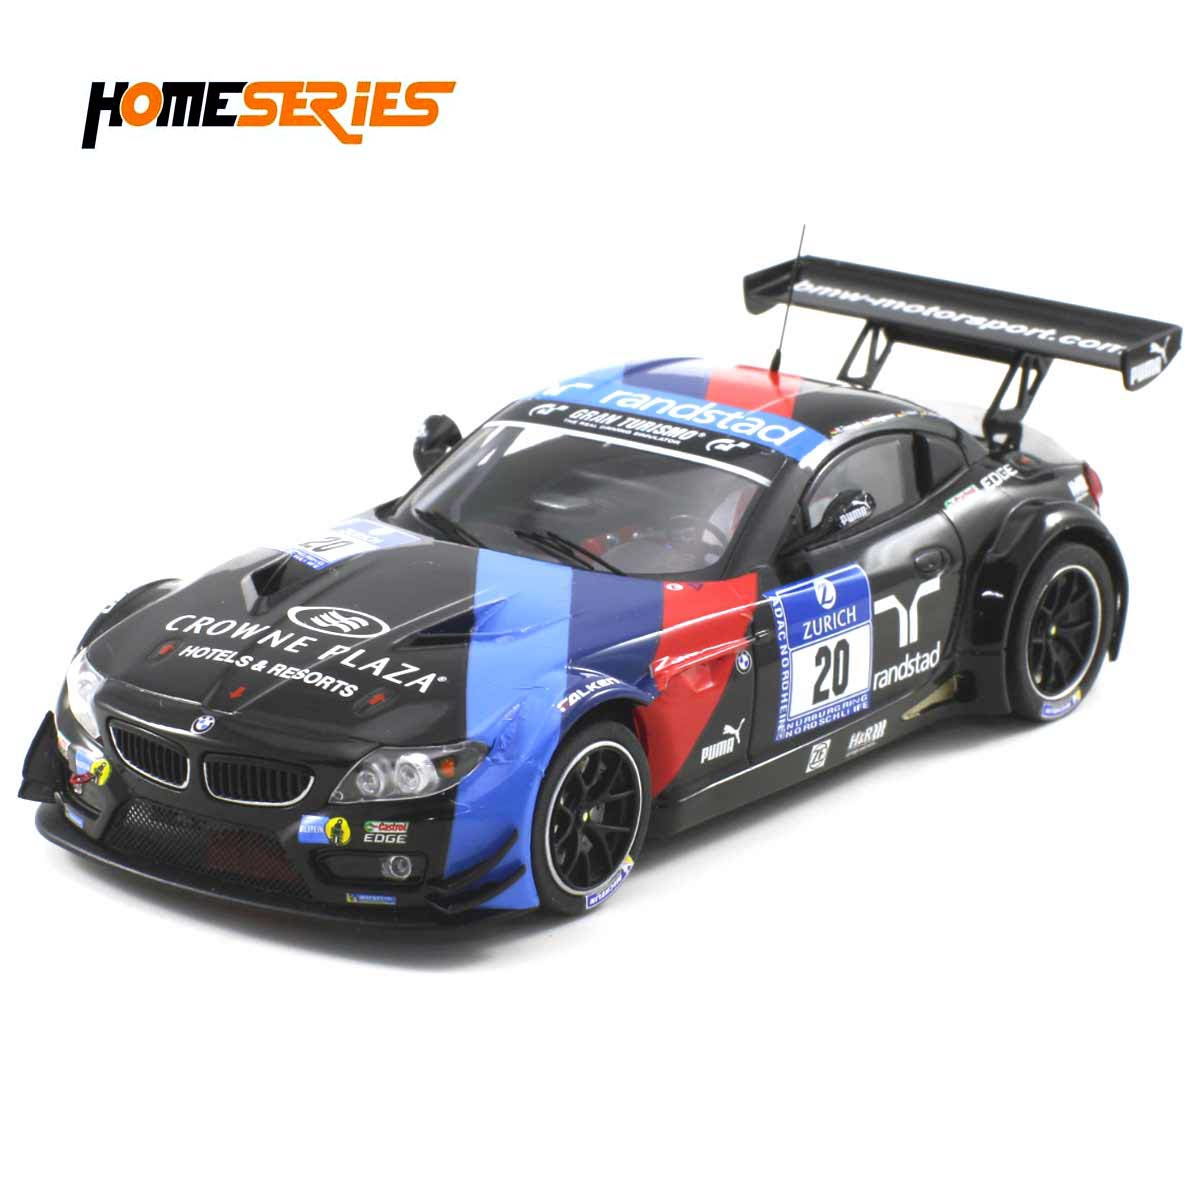 Bmw Z4 Gt3: Scaleauto BMW Z4 GT3 No.20 Team Shubert Motorsport Home